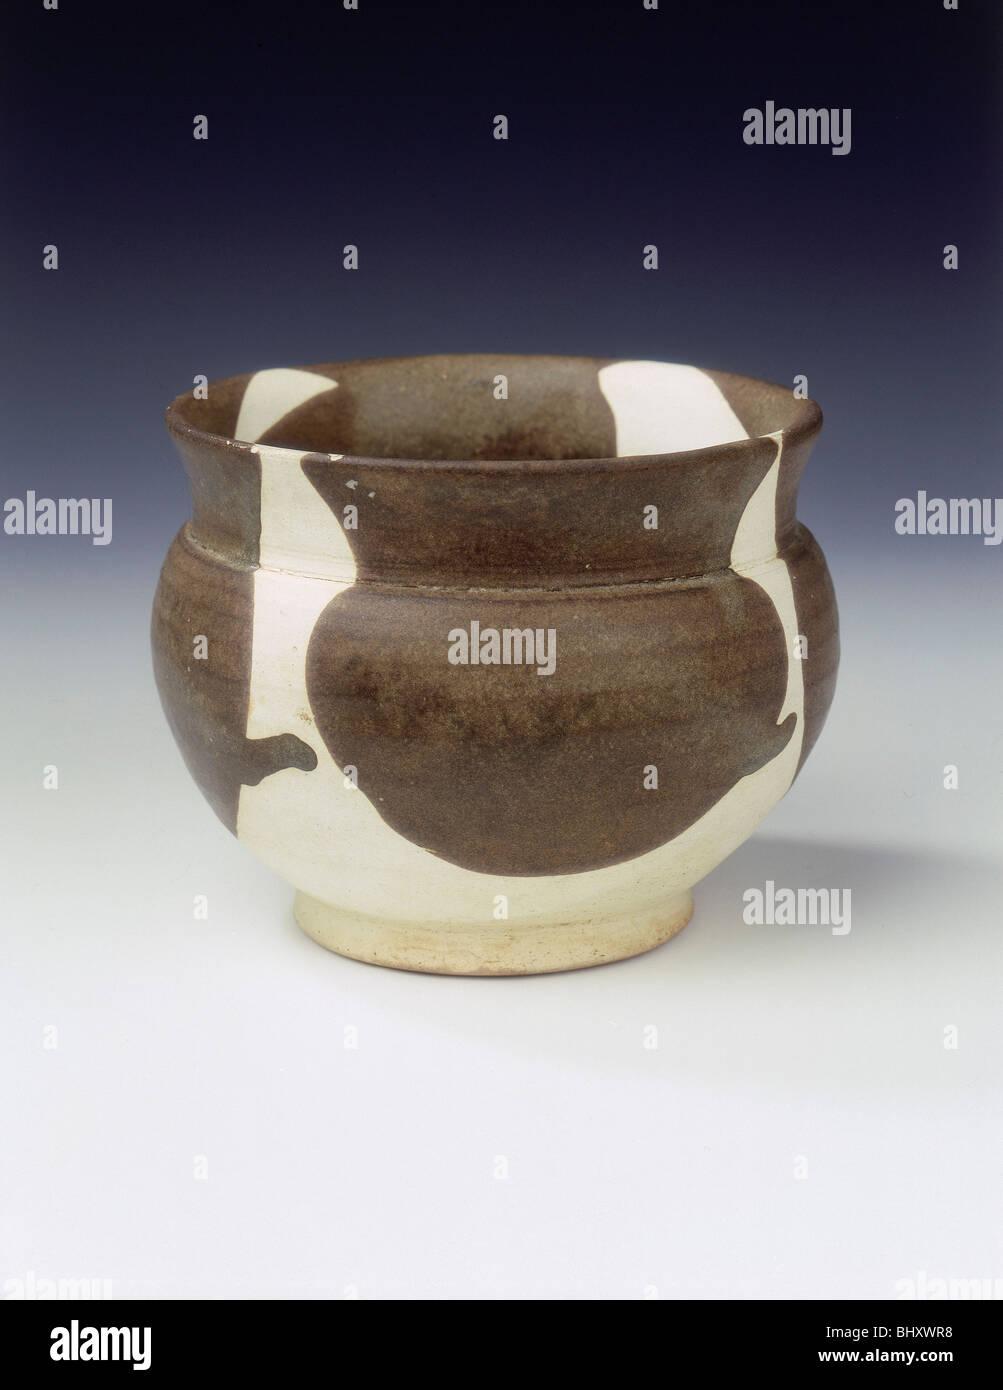 Yaozhou zhadou (slops jar), late Tang dynasty, China, 9th century. - Stock Image